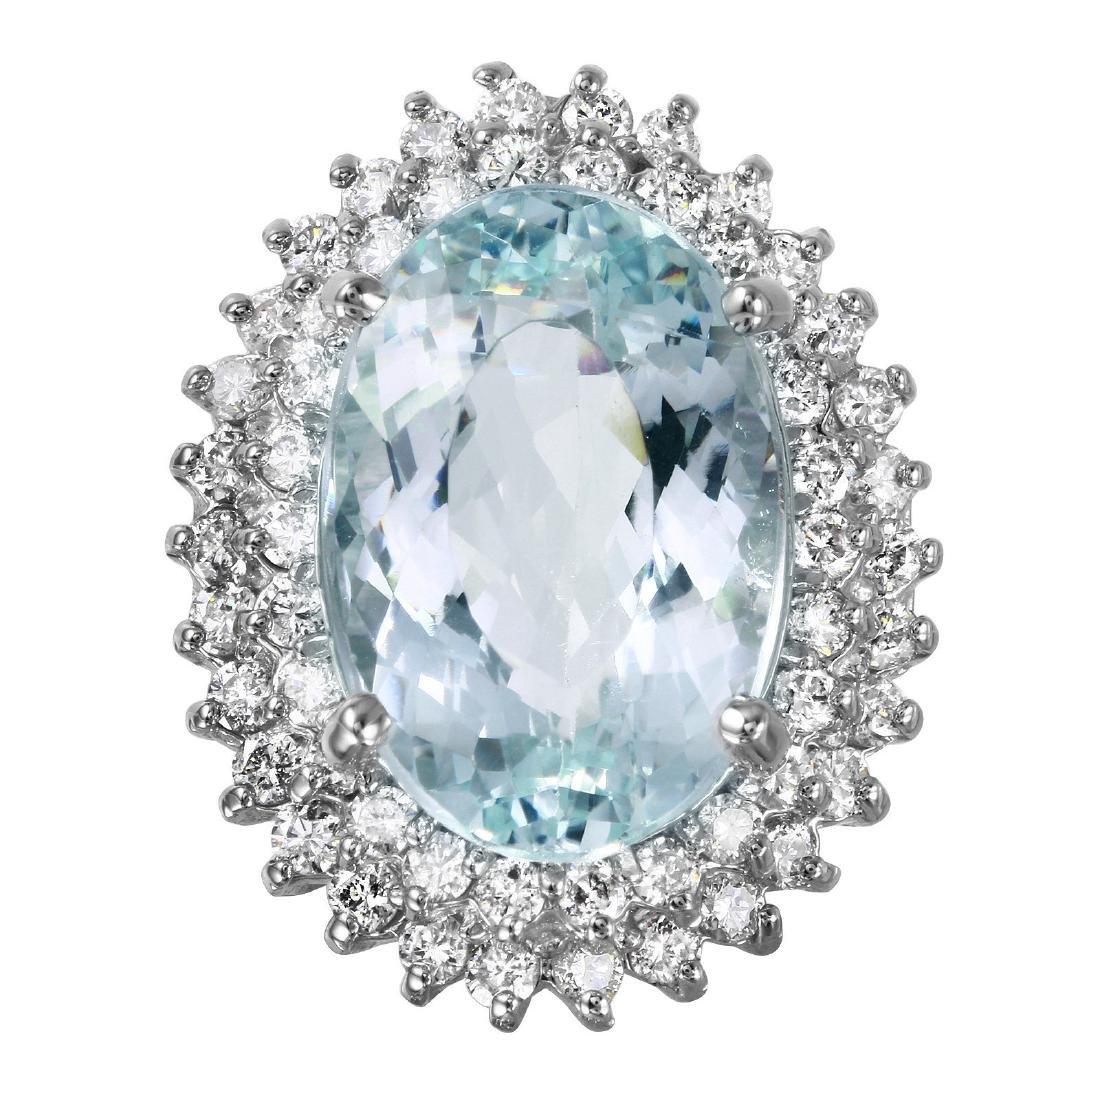 14KT White Gold 11.1ctw Aquamarine Diamond Cocktail - 3